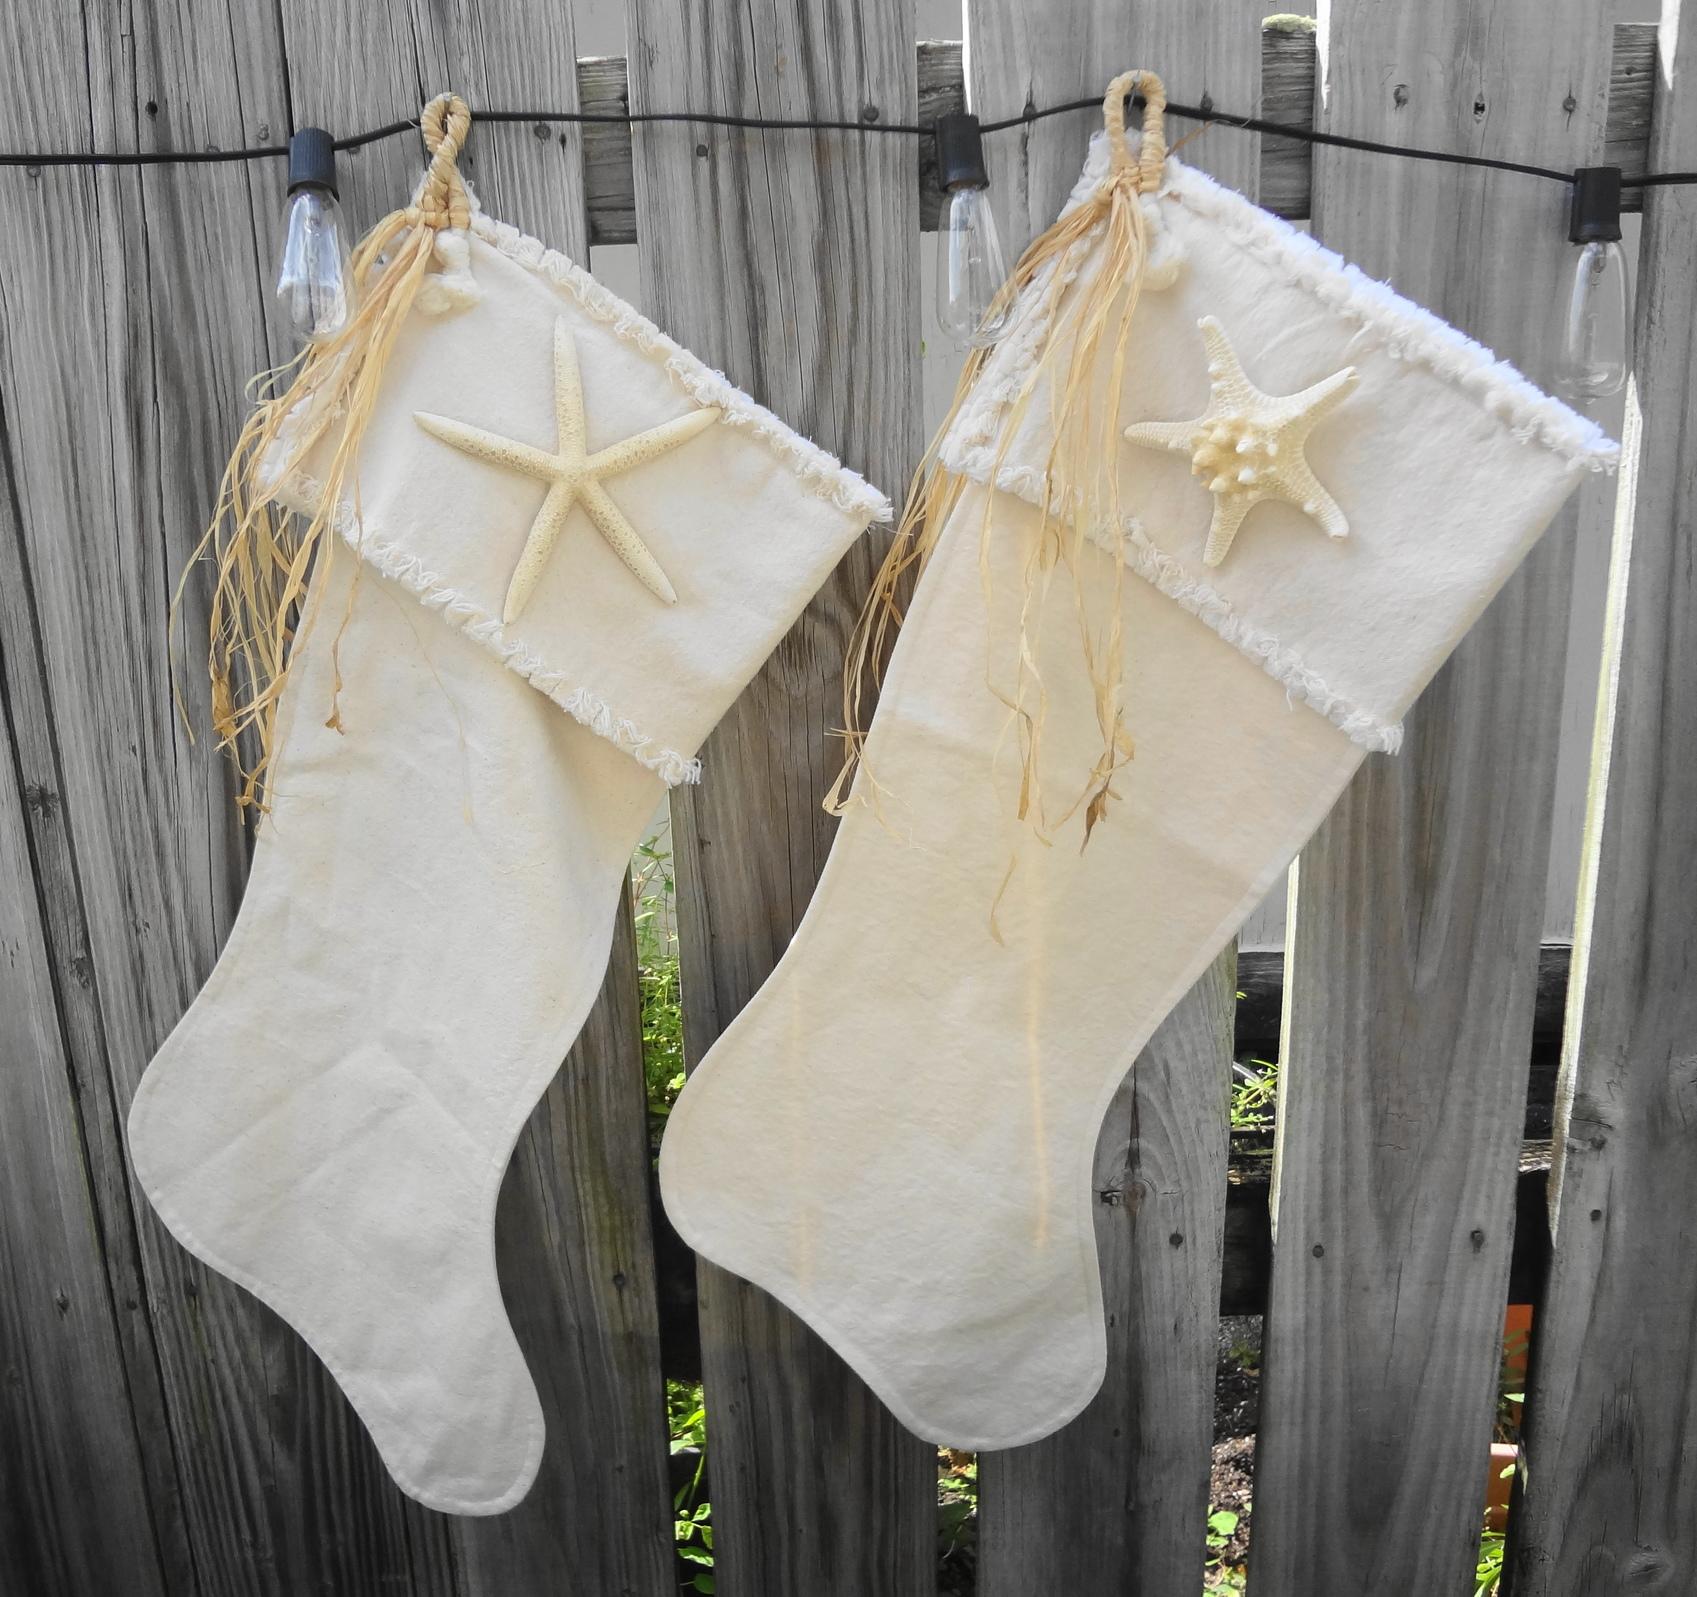 Sea Stockings